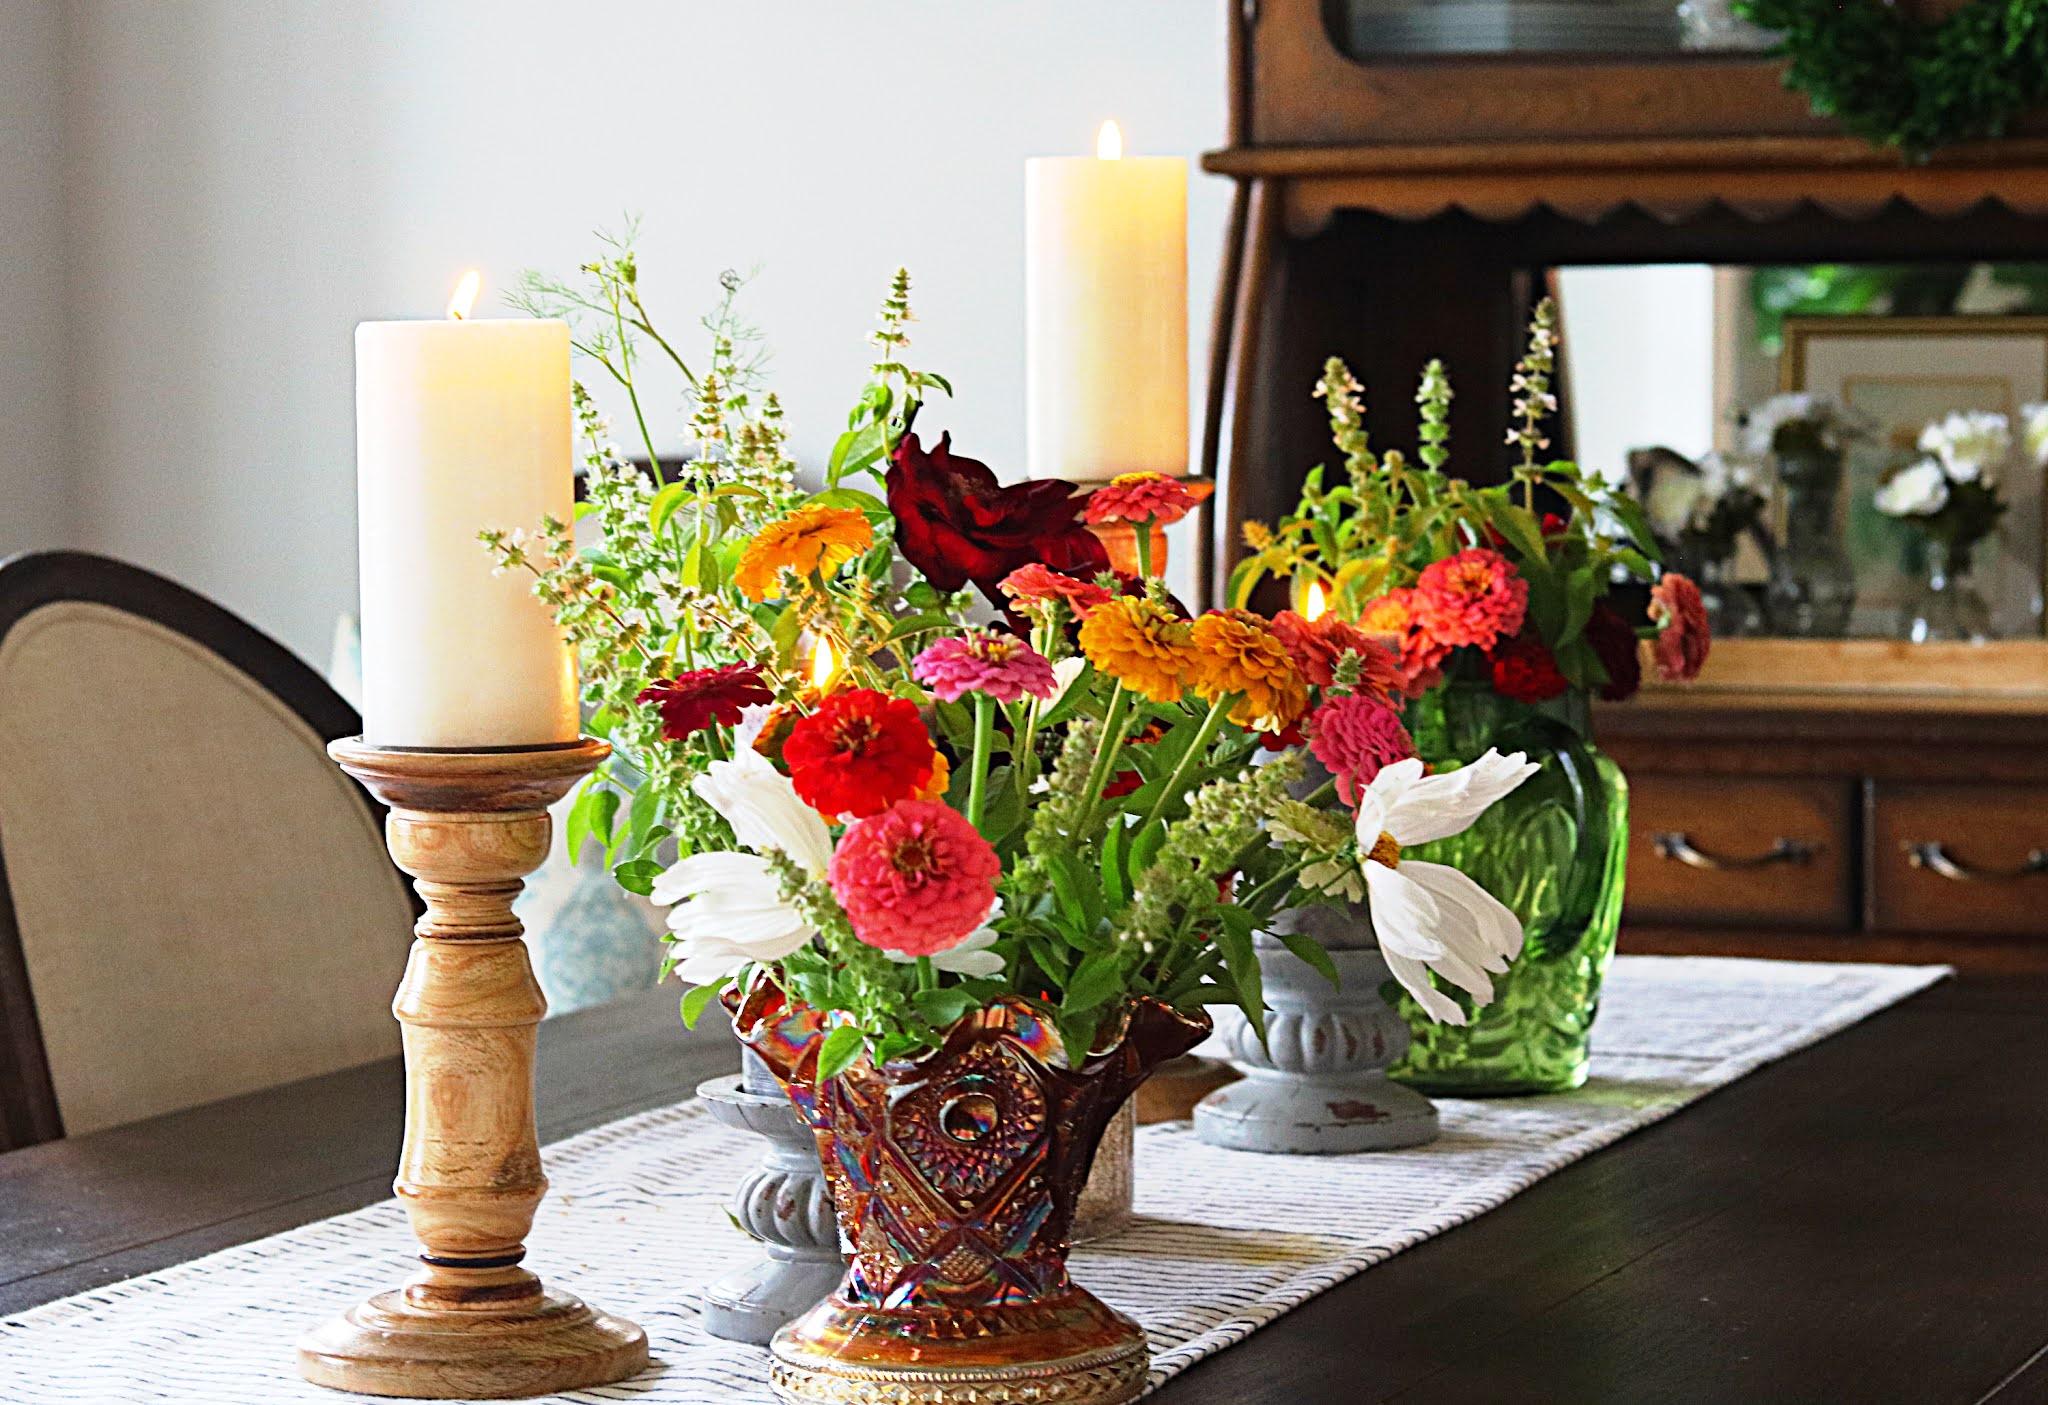 lemon-cutting-garden-basil-tips-bouquet-athomewithjemma